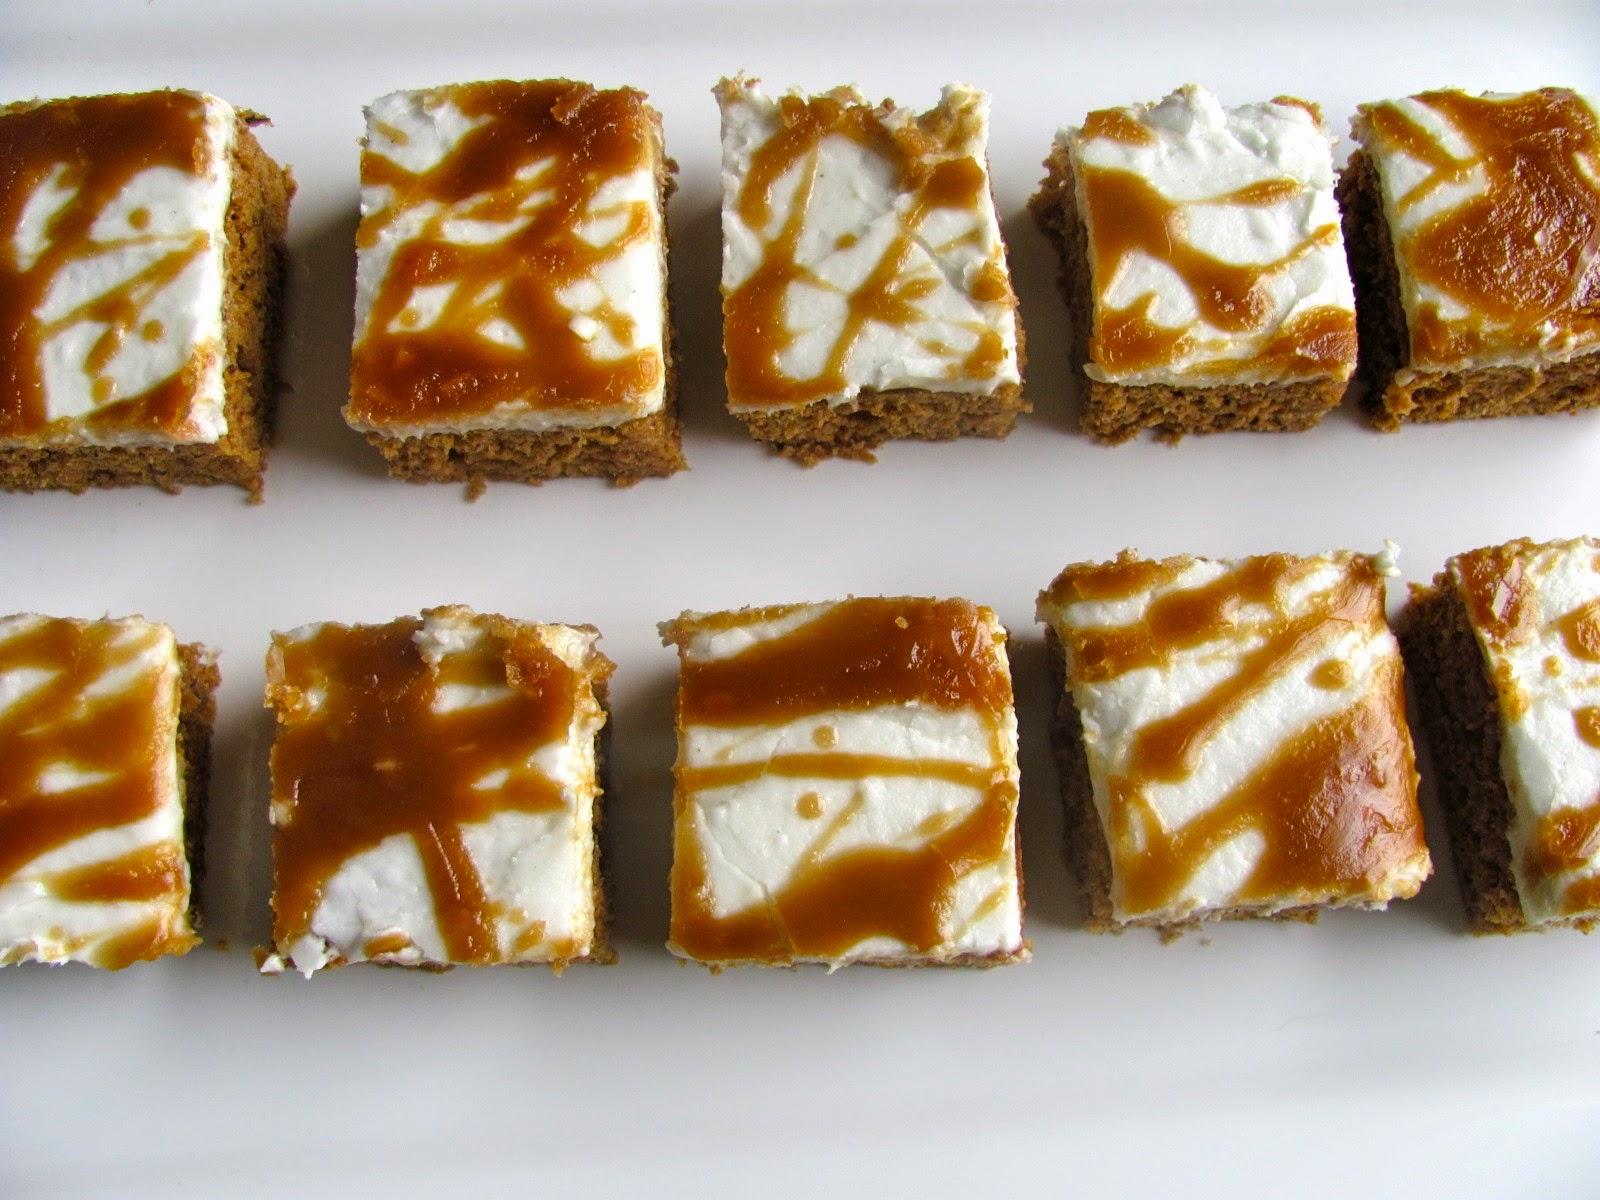 gluten free caterer denver | holiday catering denver | vegan caterer denver | clean foods caterer | vegan baking | gluten free baking denver